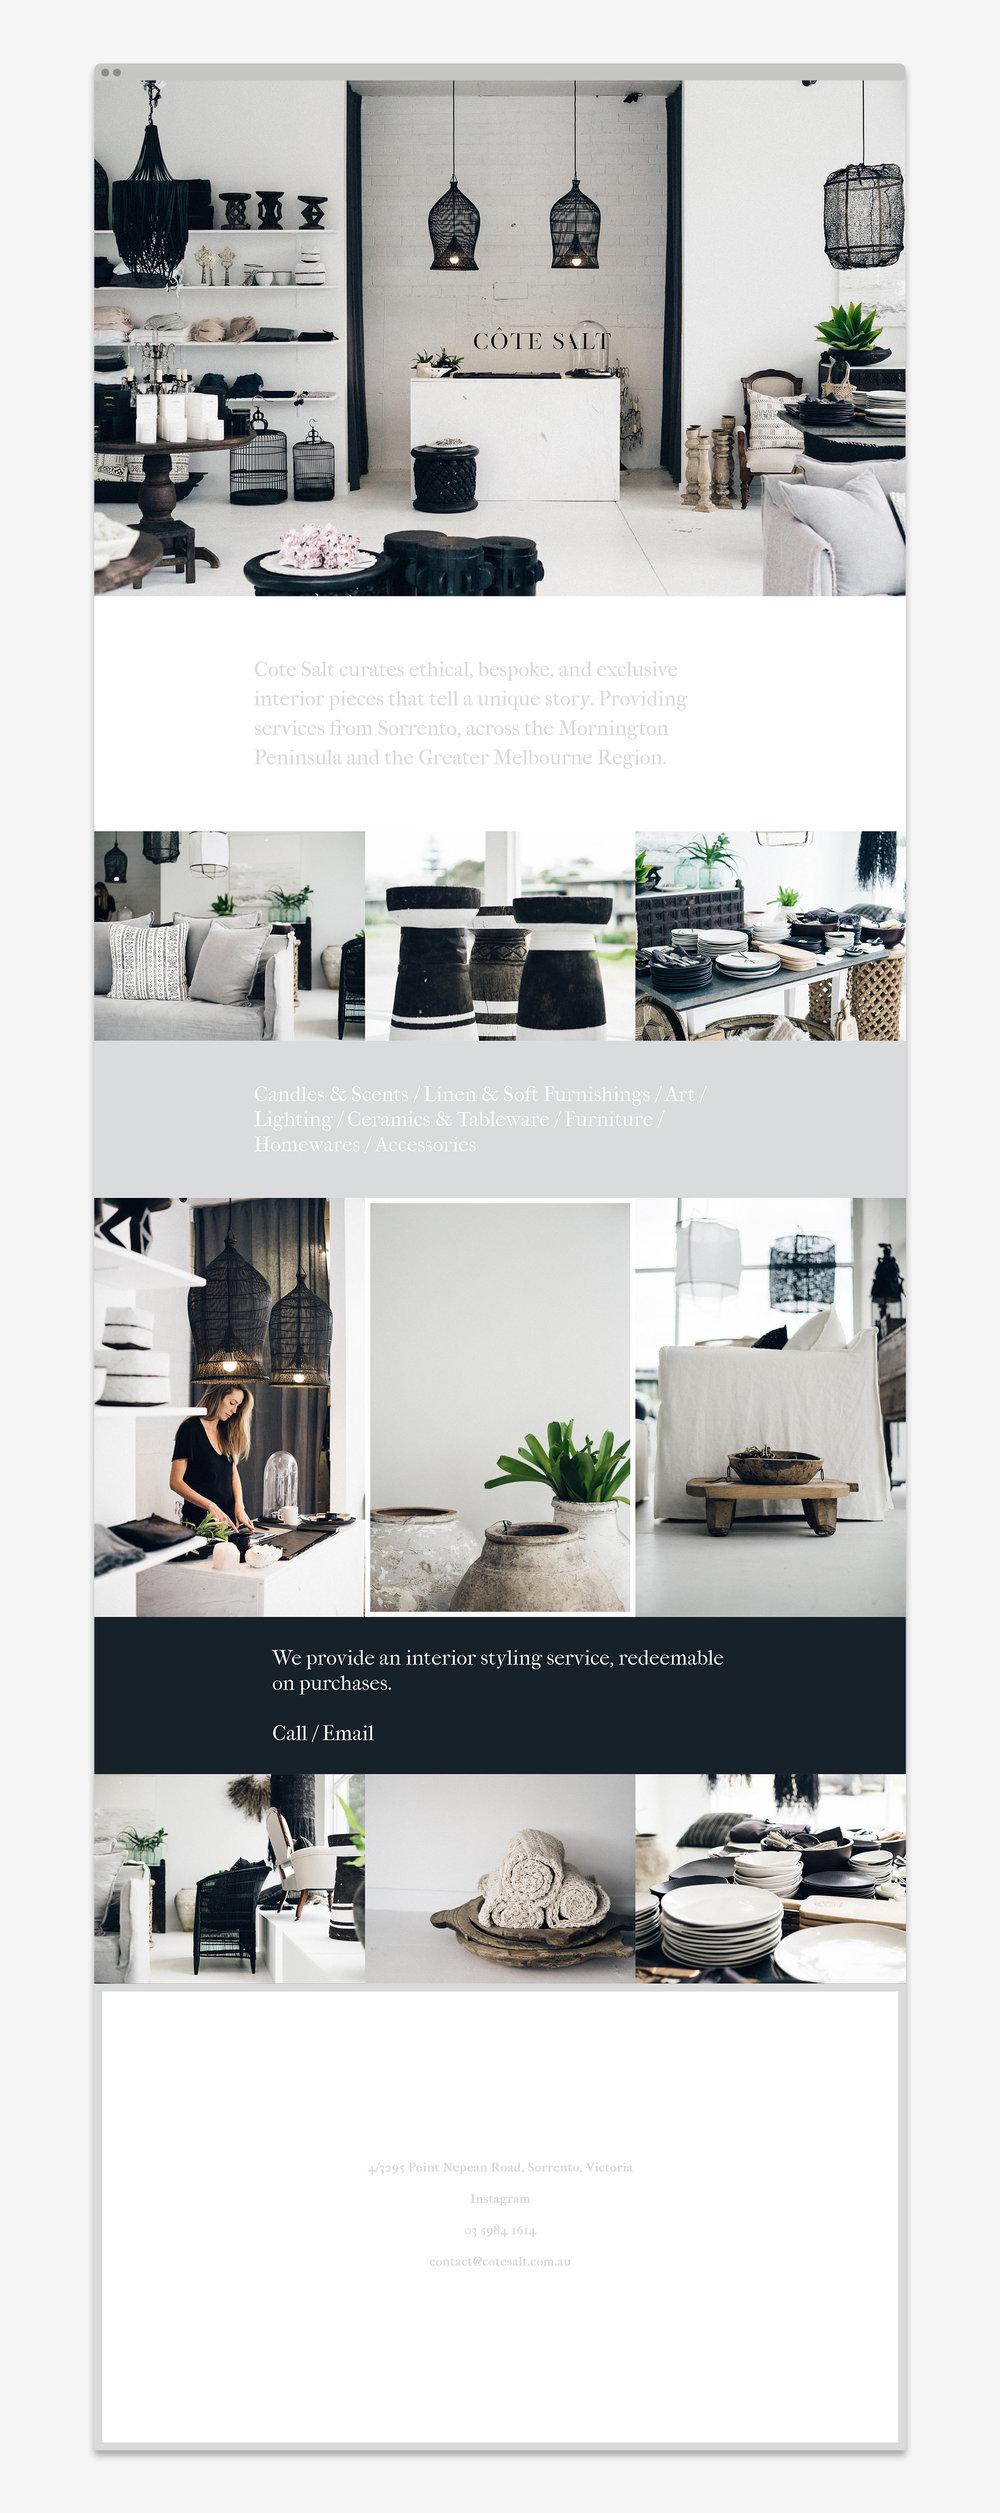 Cote Salt Website Development